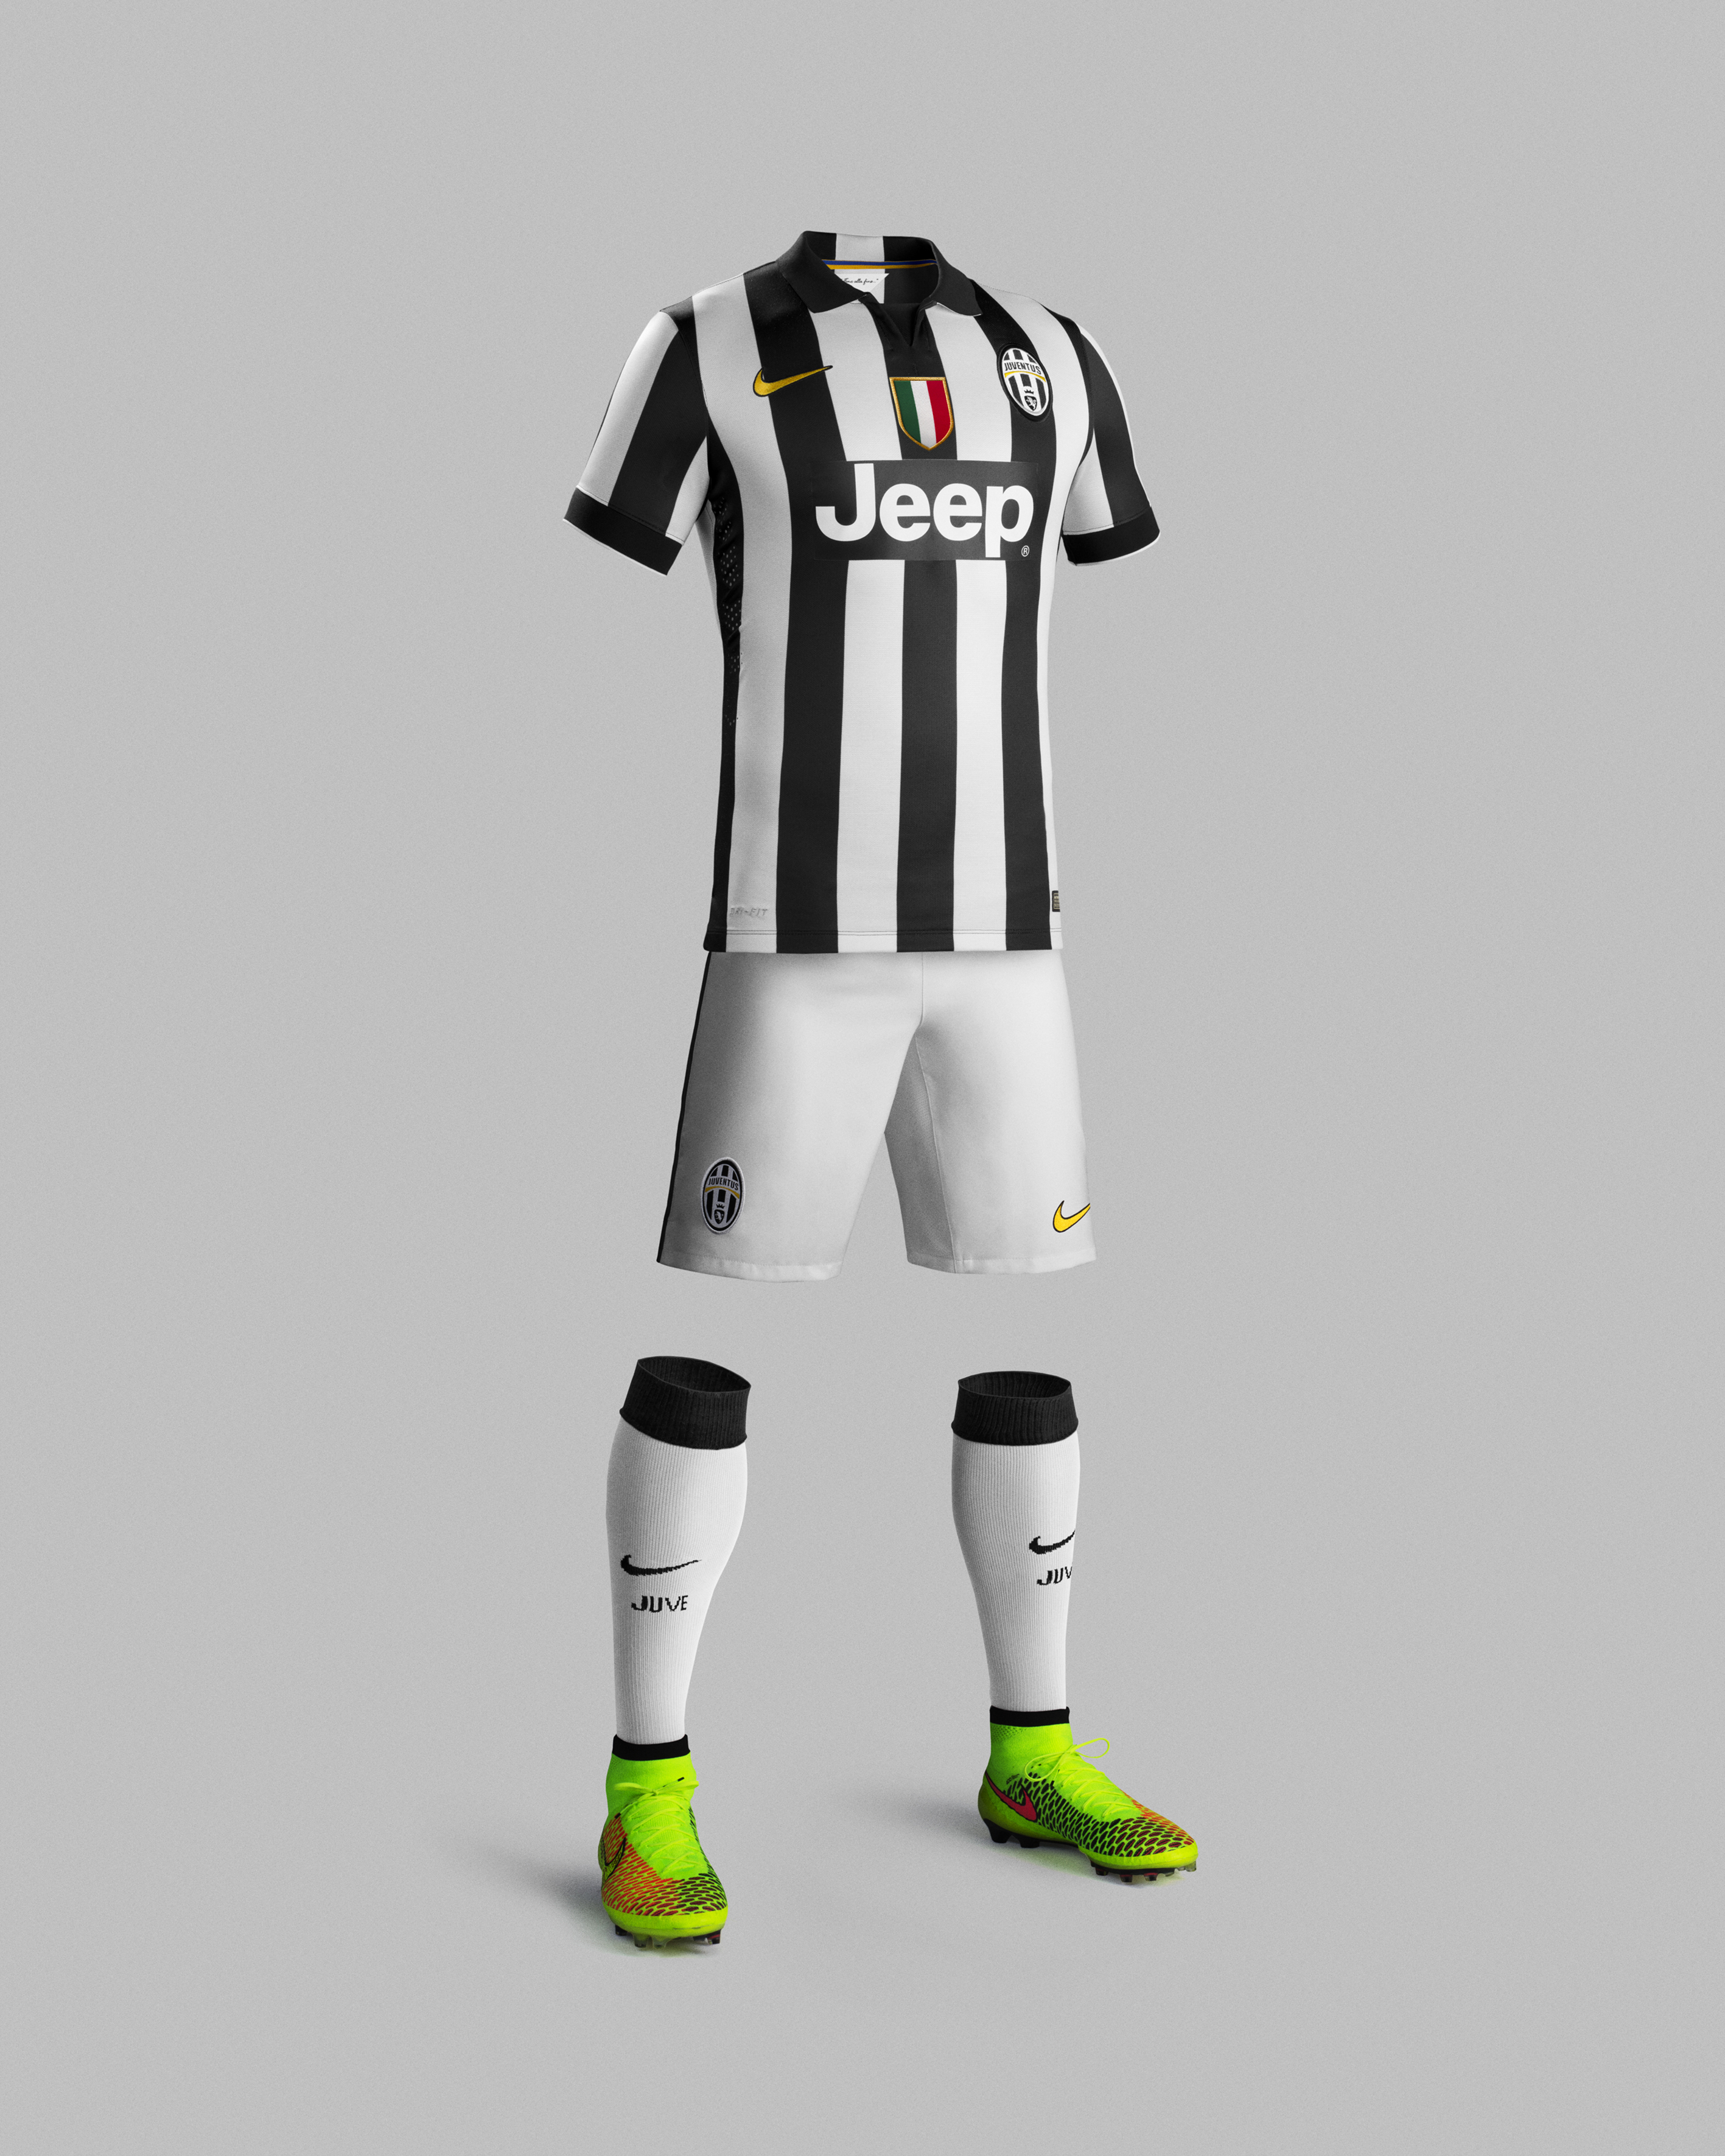 92ec20e3a42 ... Fa14matchjuventusprafullbodyroriginalmedium  pre order 57be4 9019b Nike  and Juventus Unveil New Home and Away Kits for 2014- ...